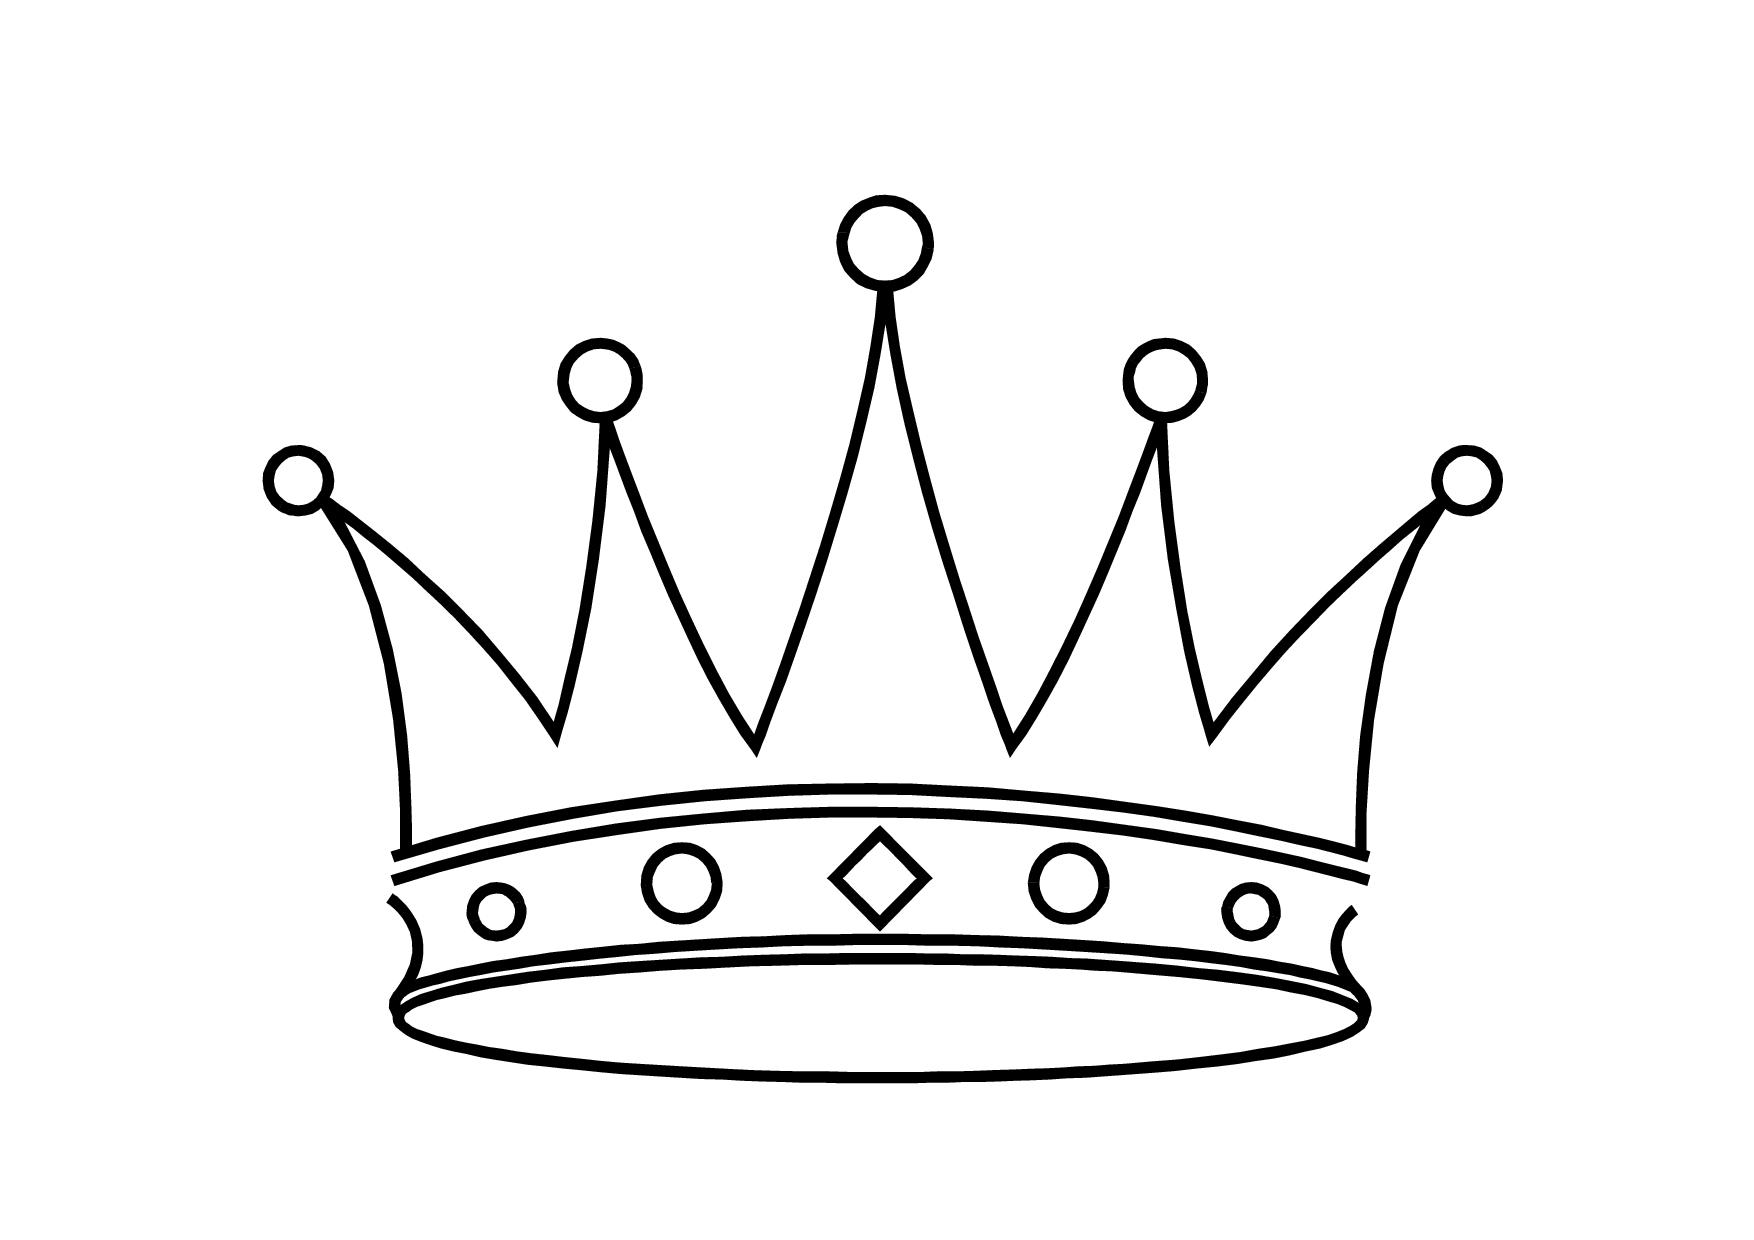 King crown clipart kid 2